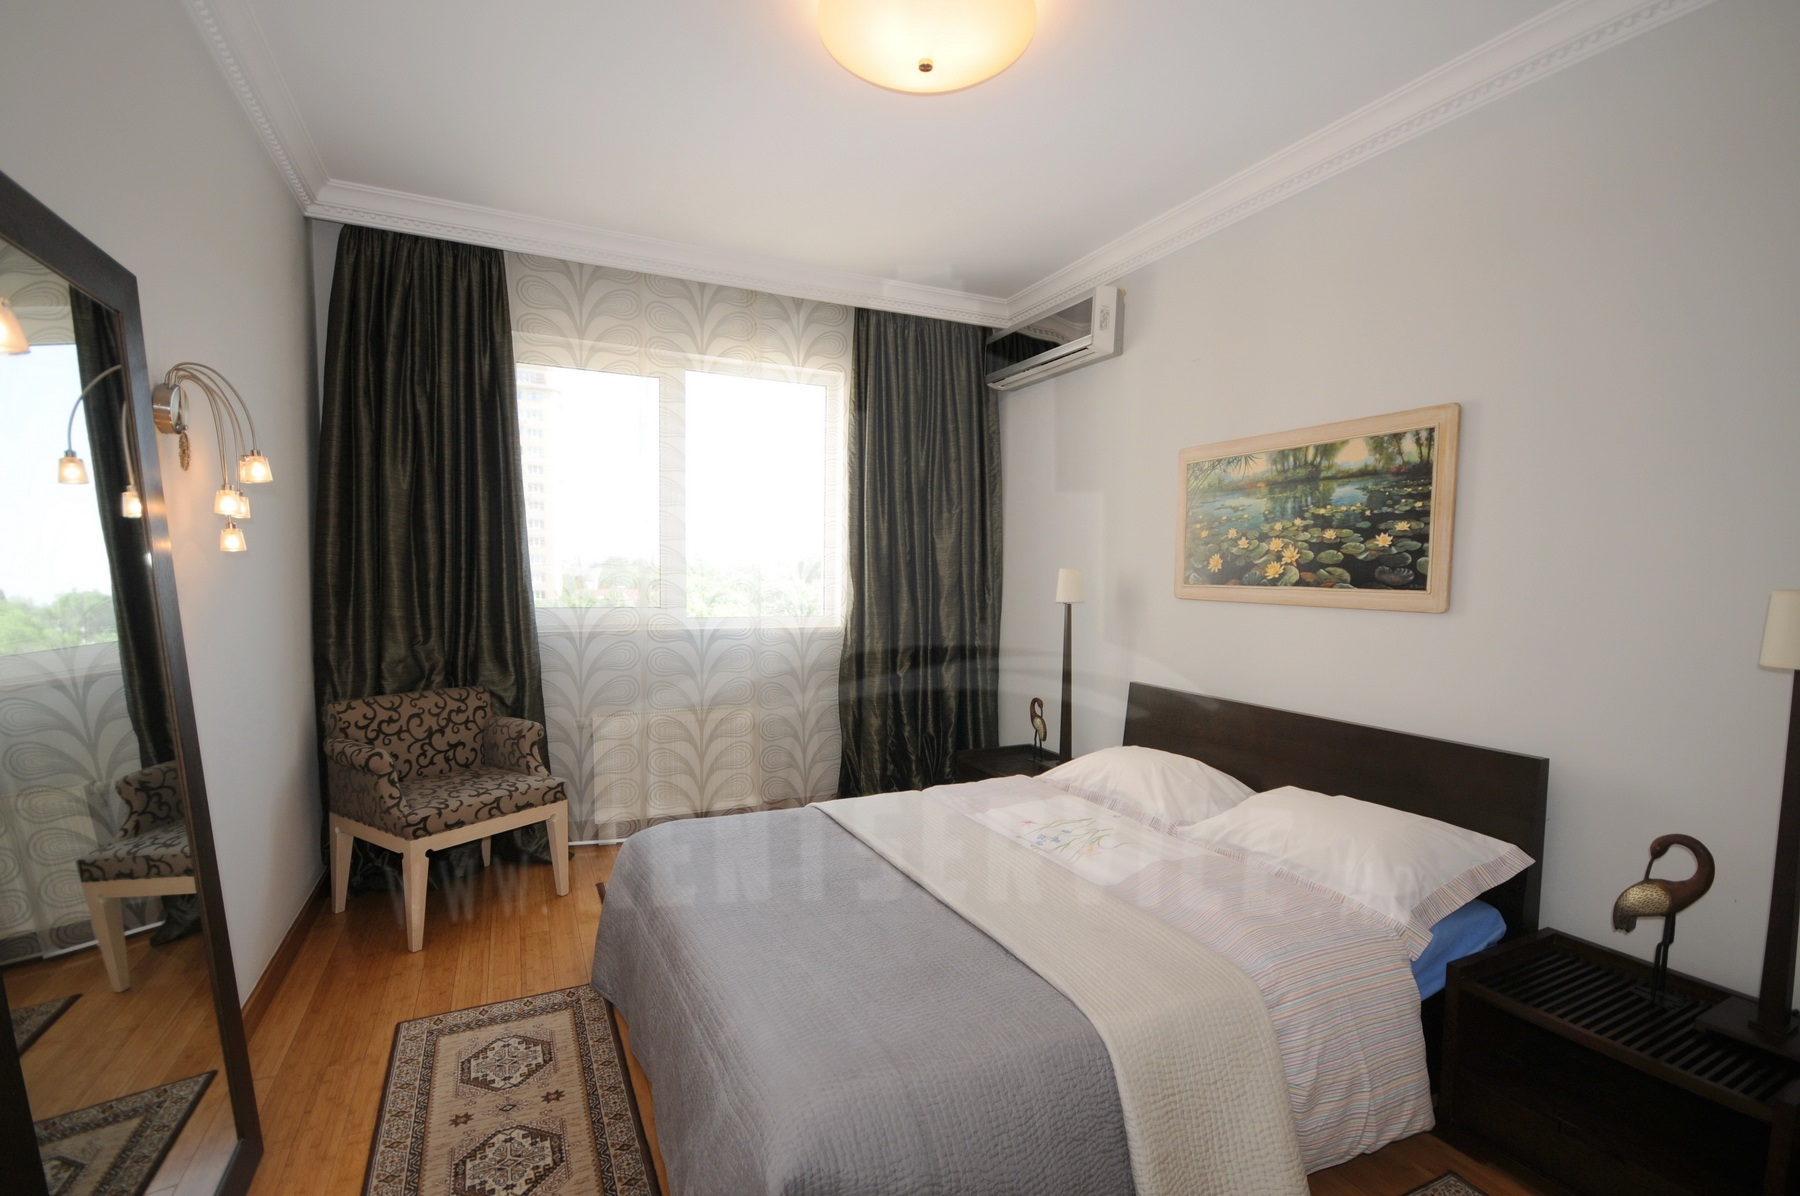 2054_apartment_11.JPG